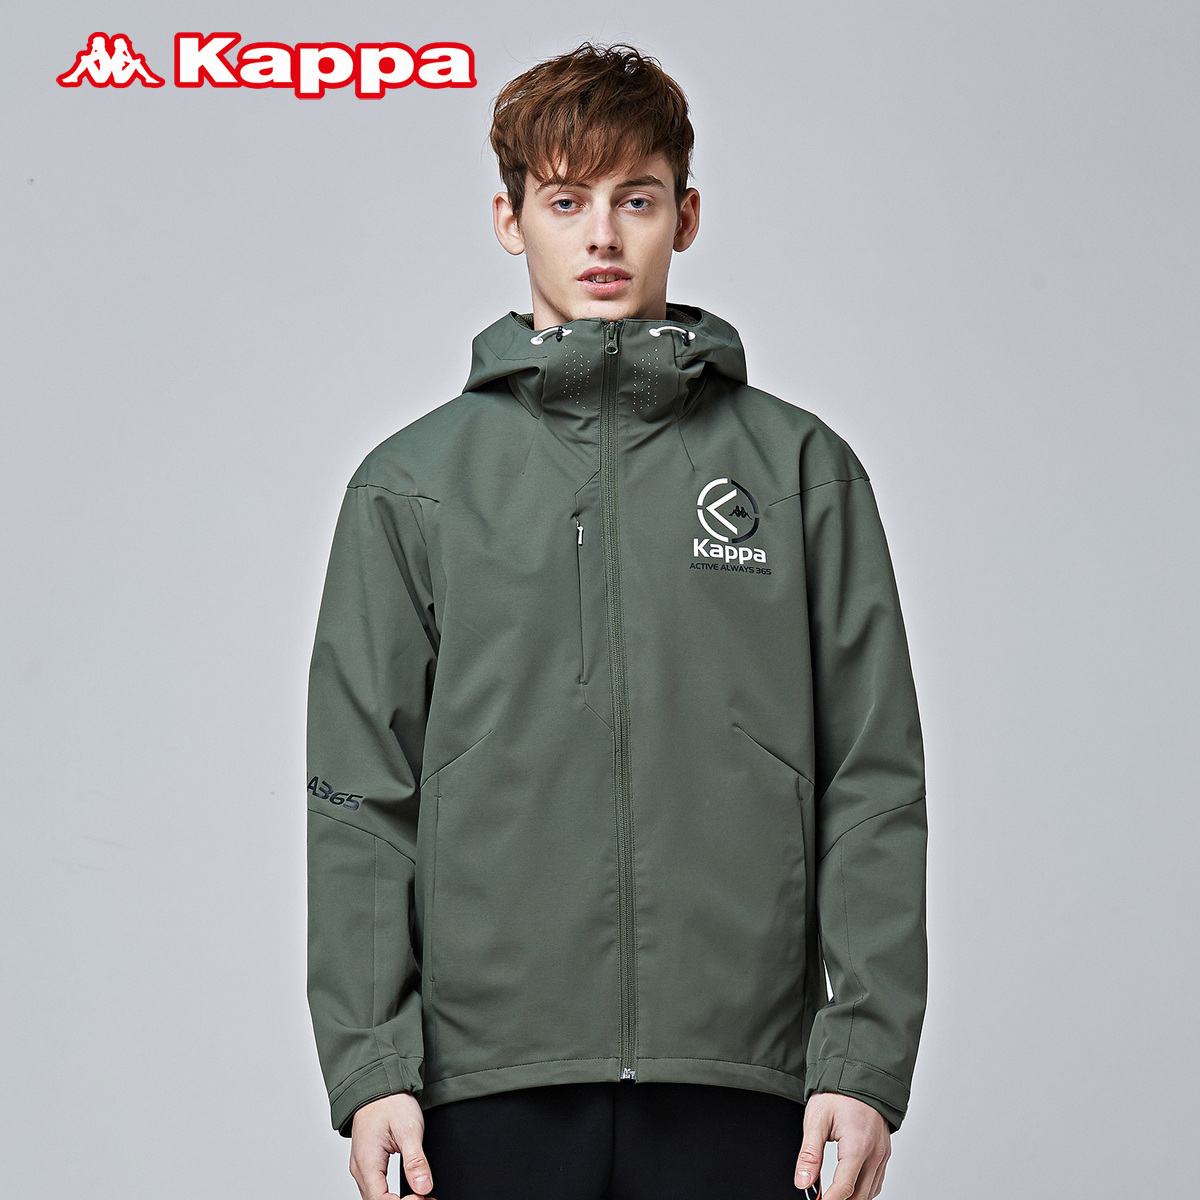 Kappa卡帕男款运动卫衣 防风衣休闲运动外套 2018新品|K0812FJ08